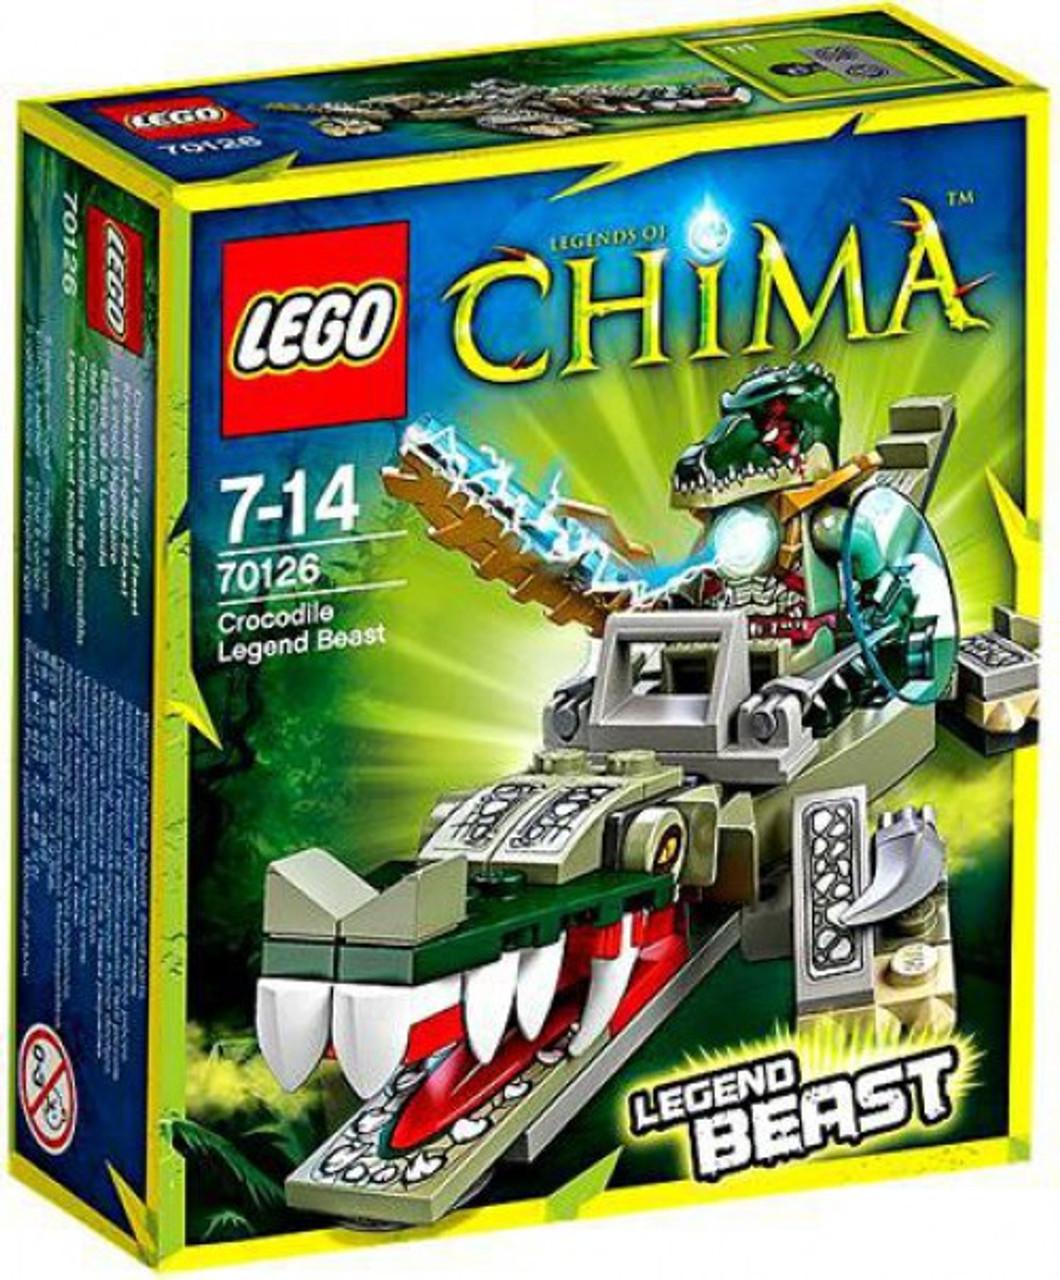 LEGO Legends of Chima Crocodile Legend Beast Set #70126